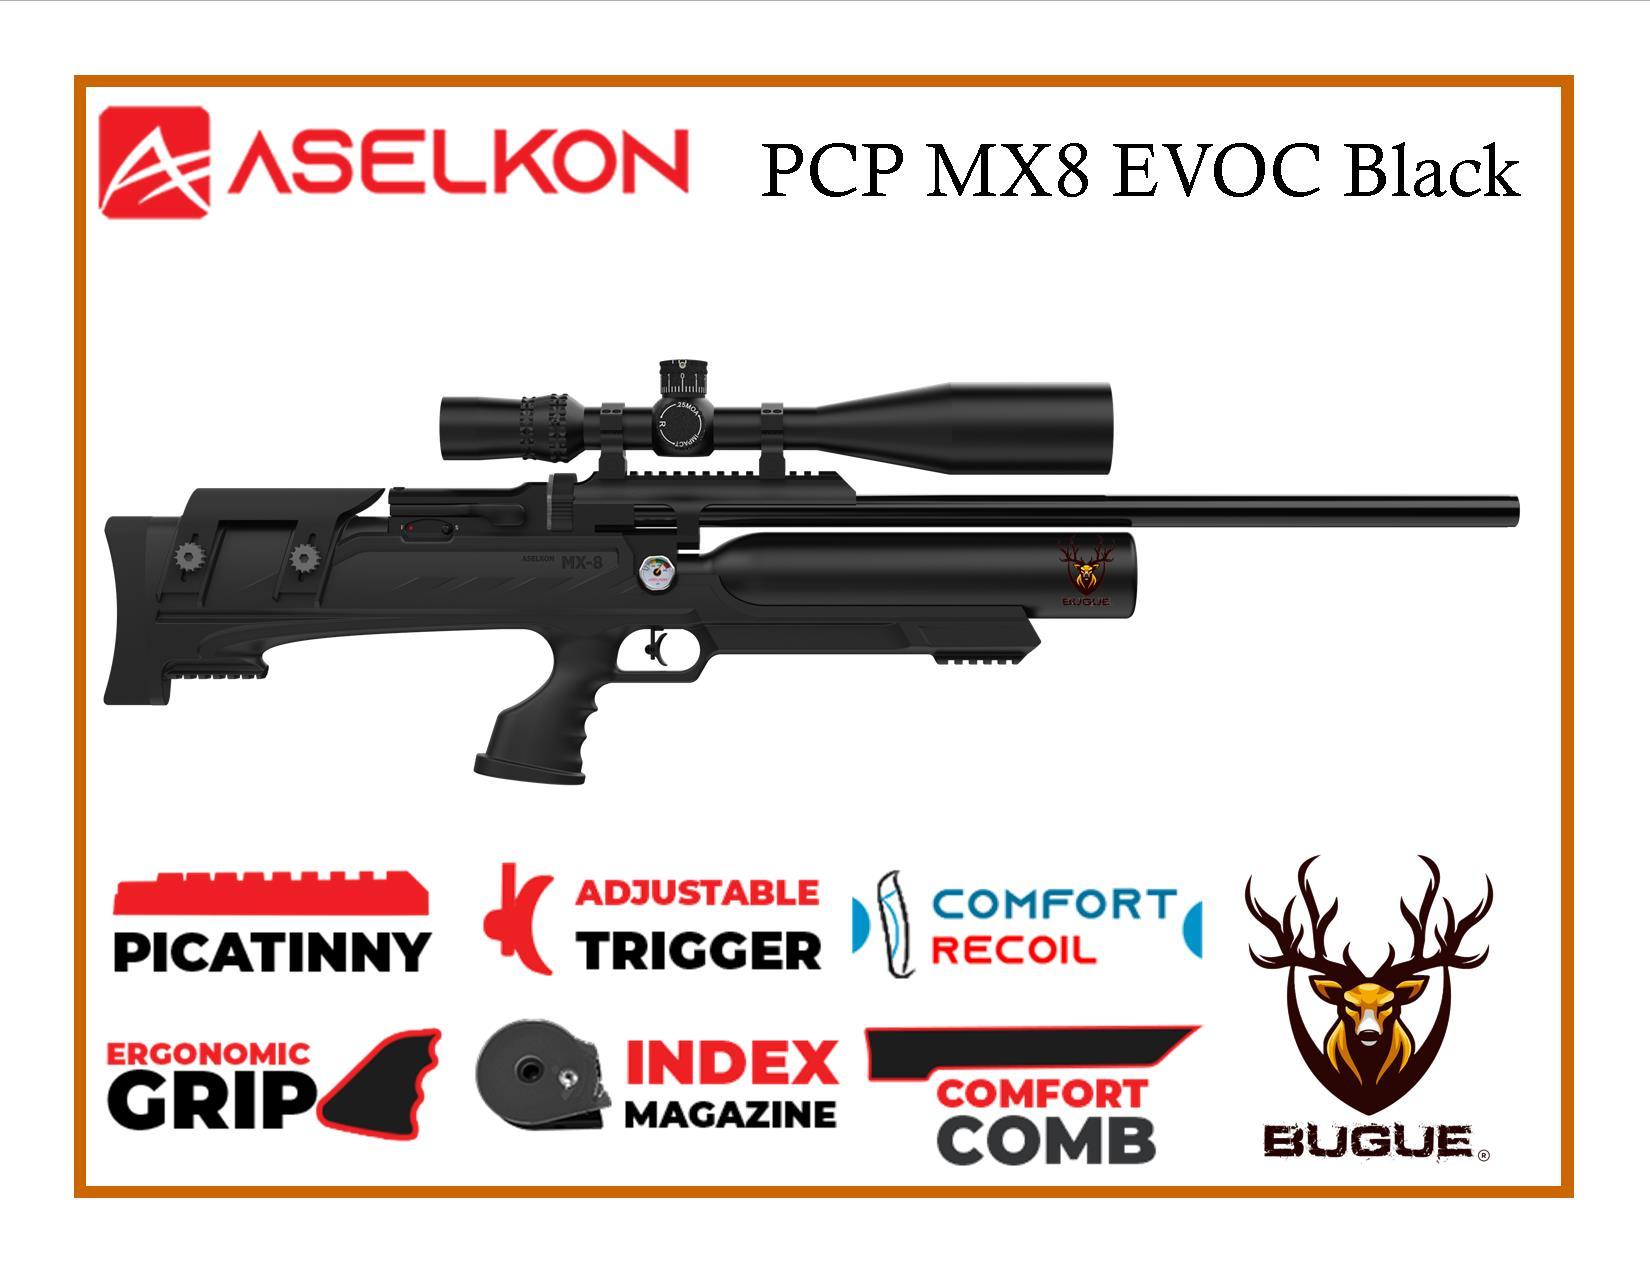 RIFLE PCP ASELKON MX8 EVOC BLACK 5.5 MM